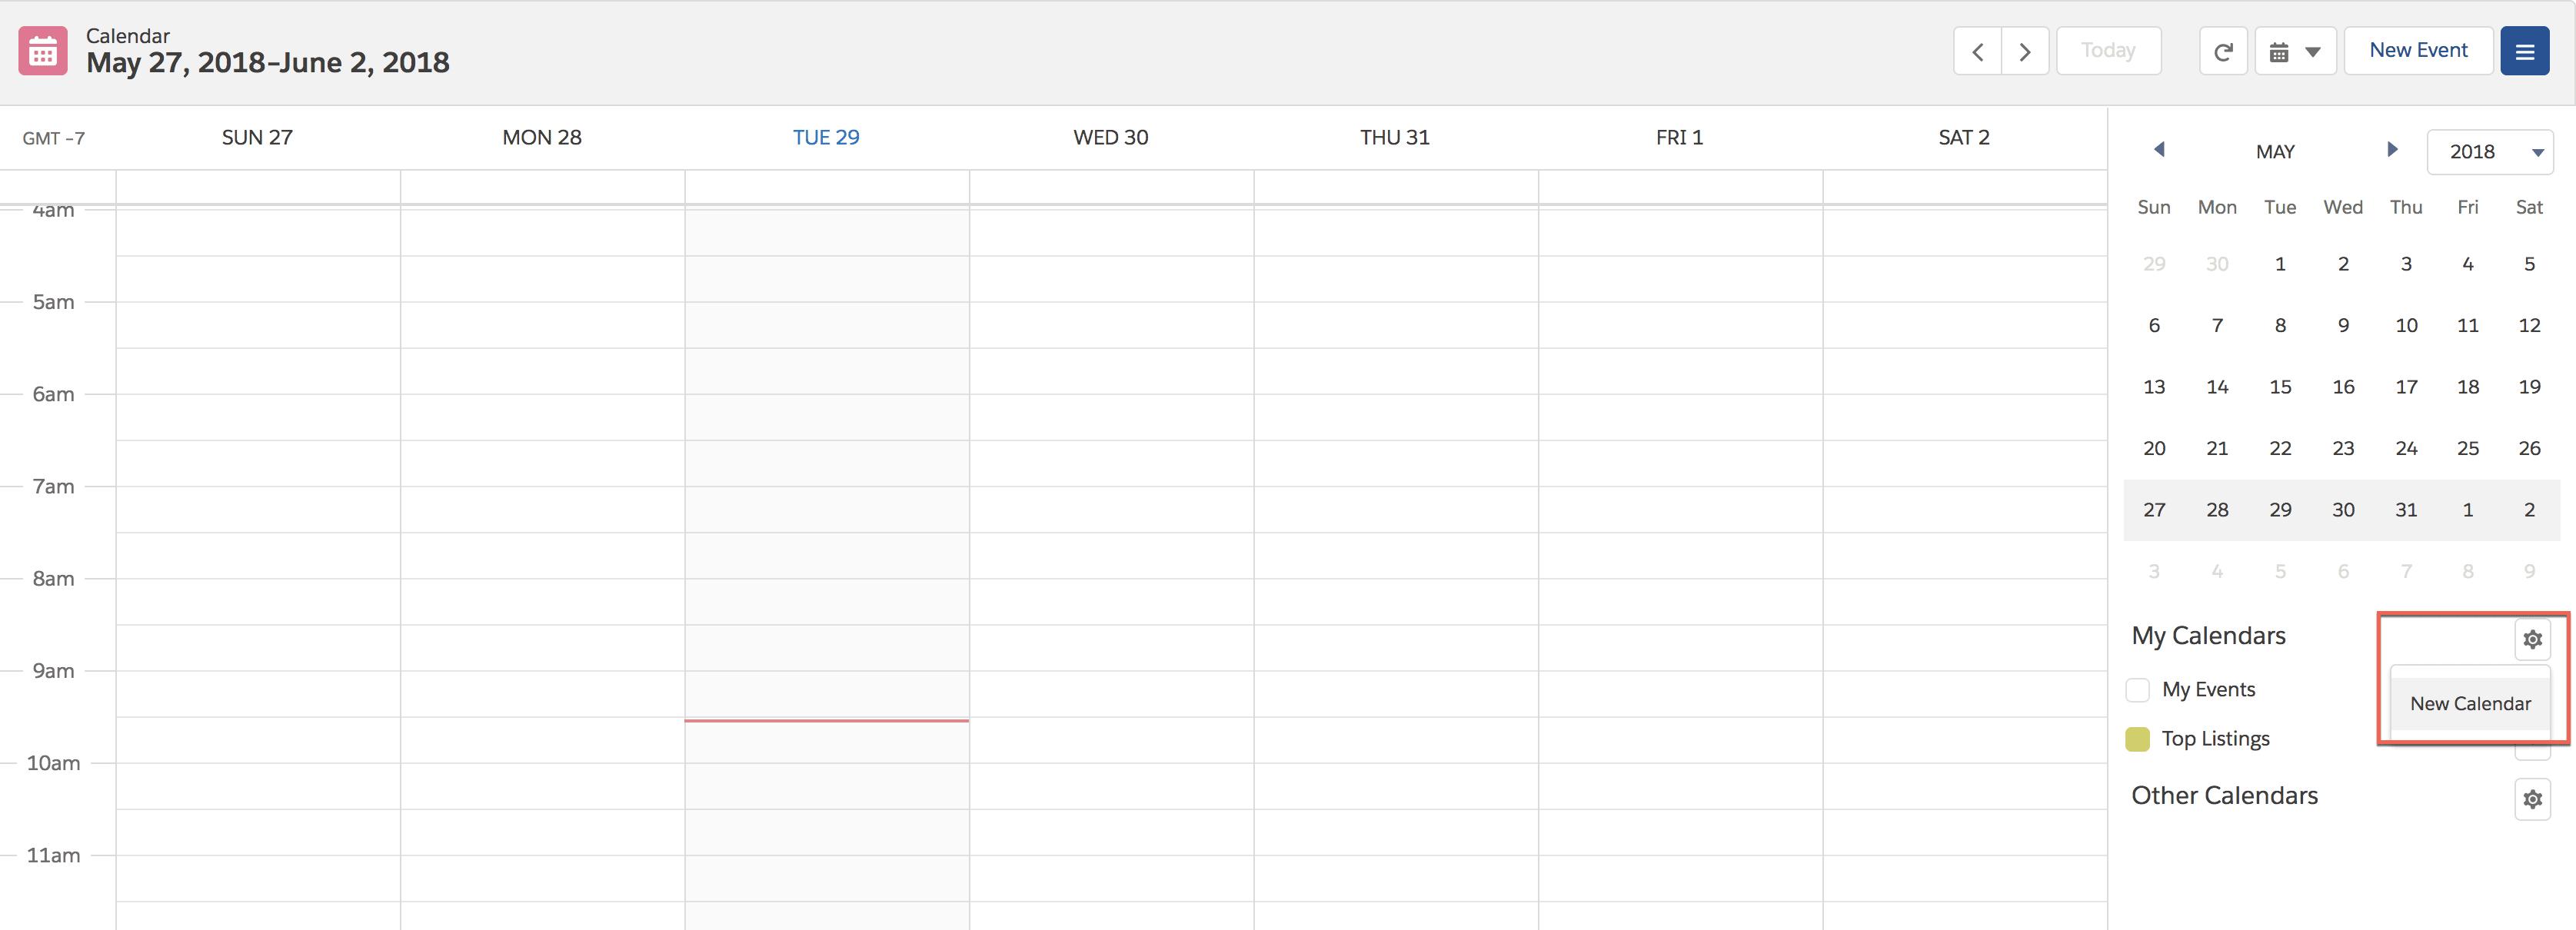 Image to create a new calendar